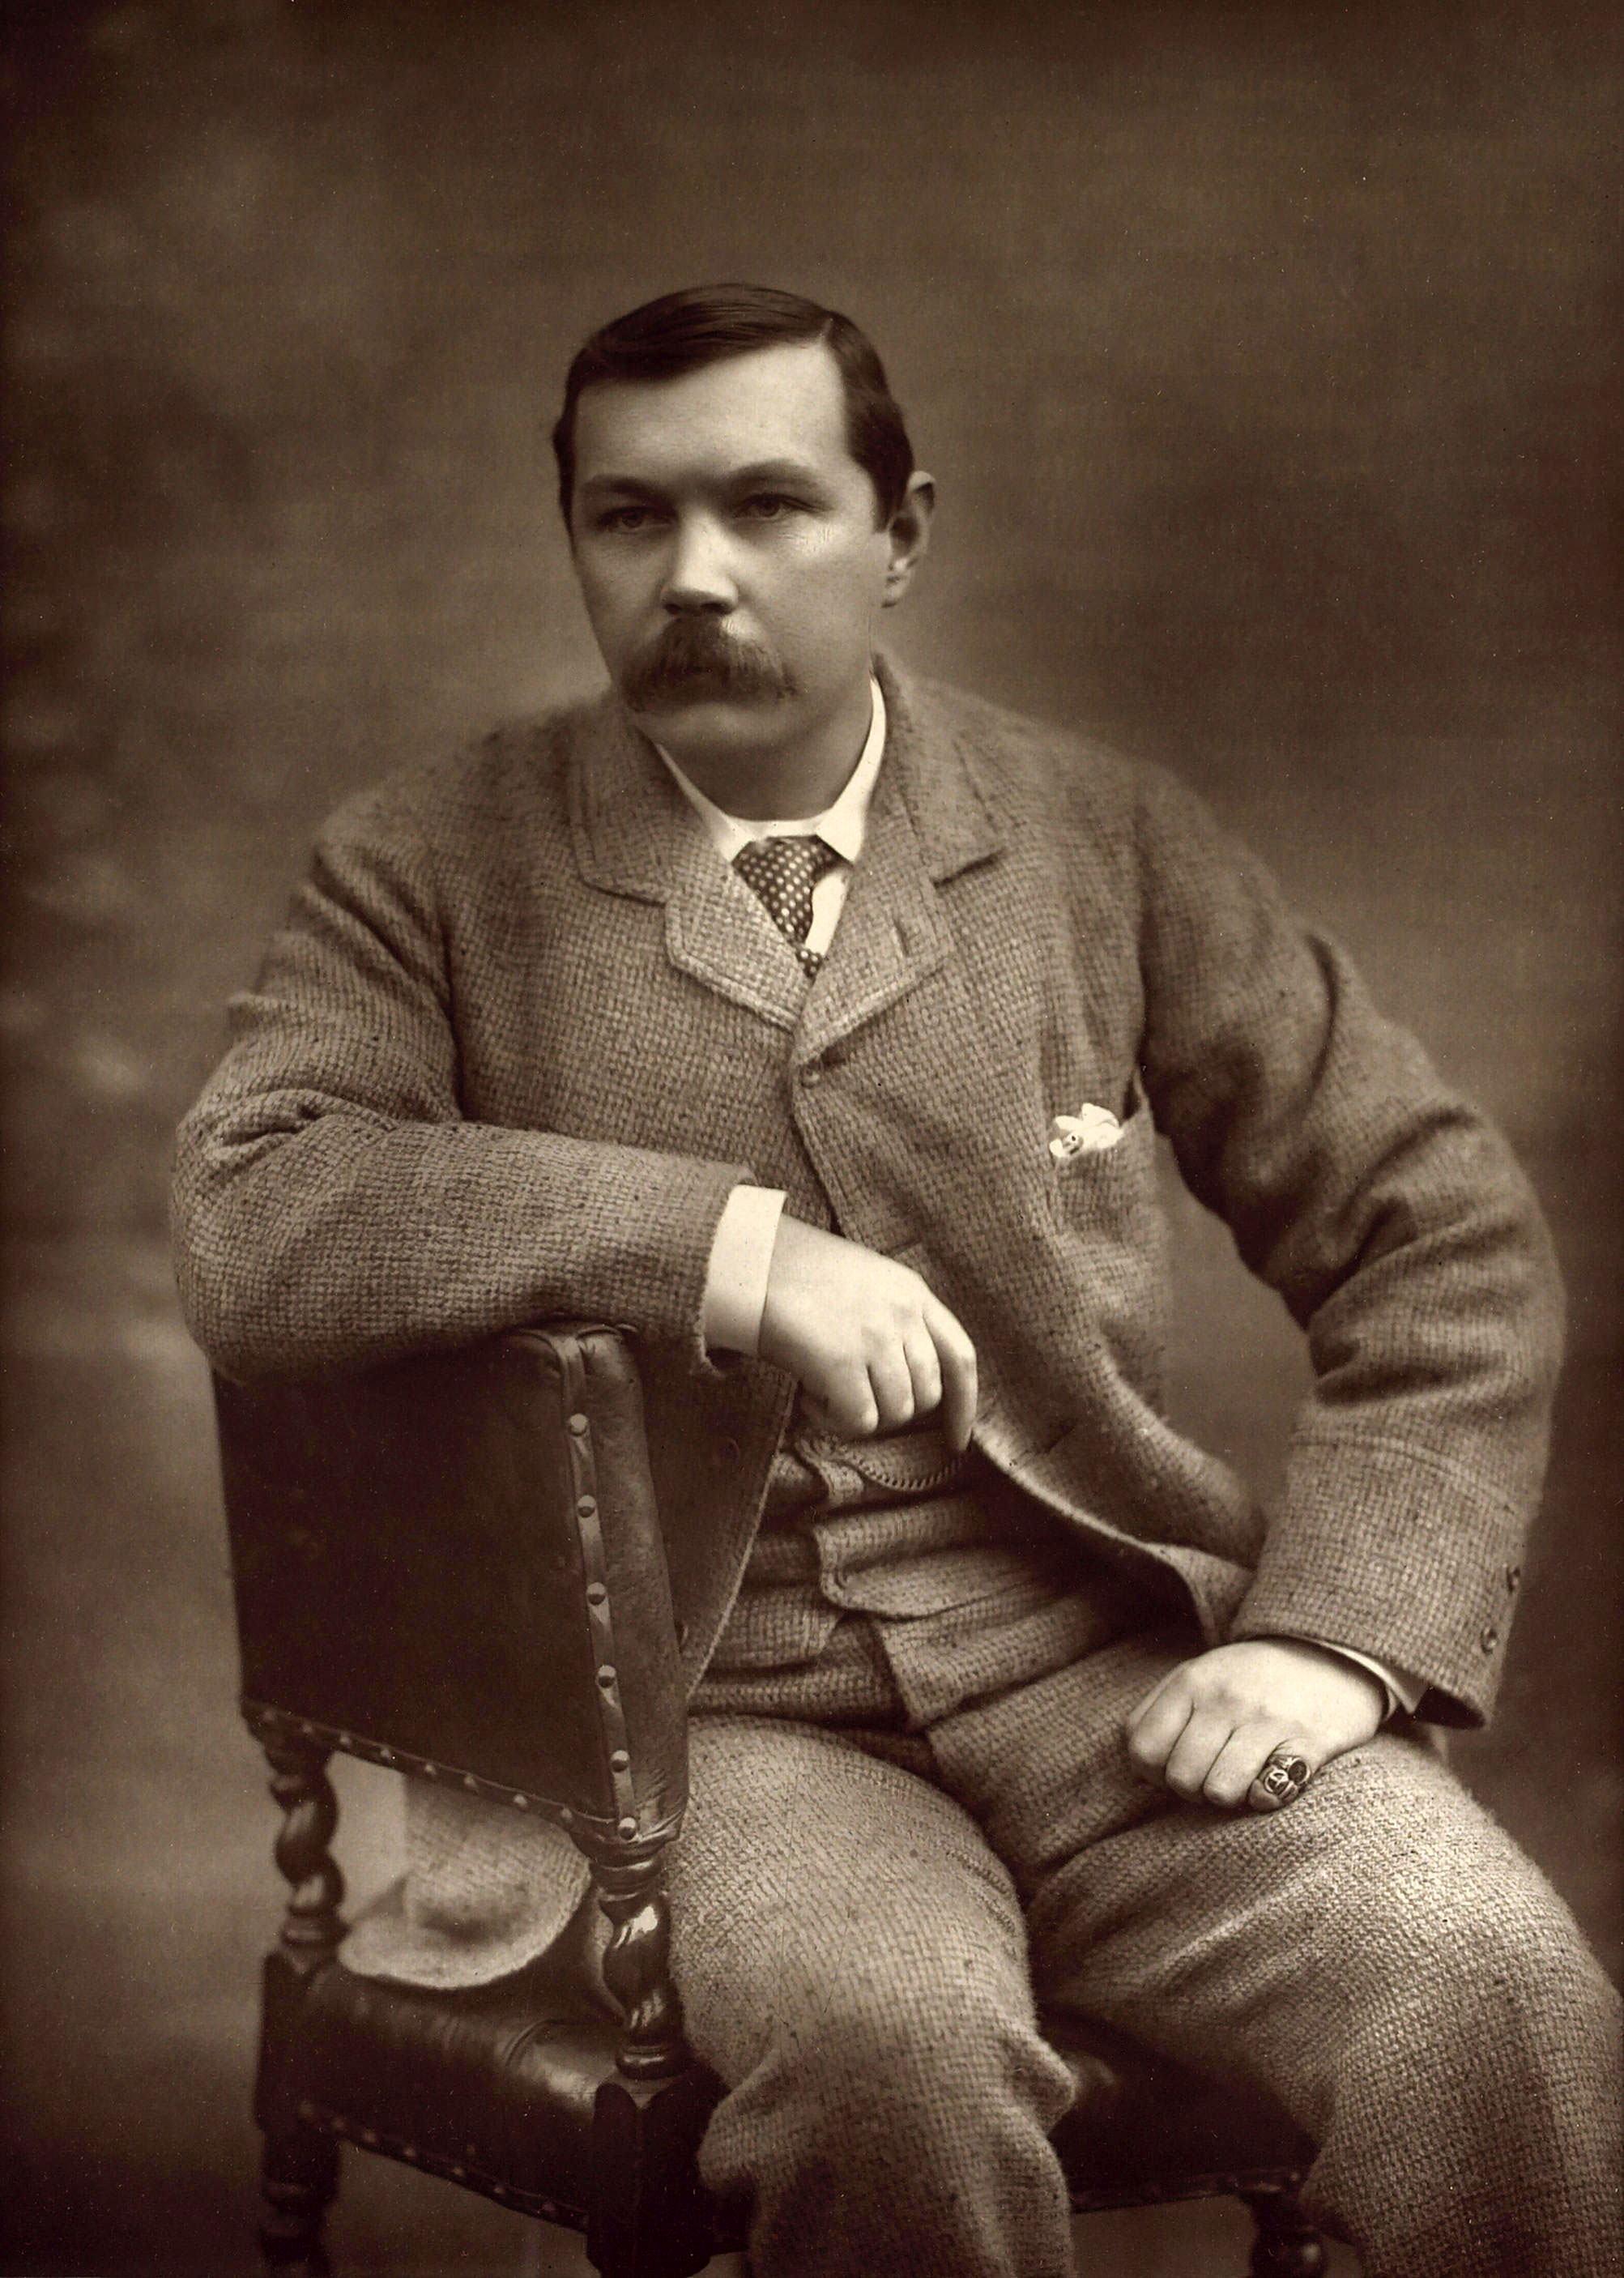 Portrait of Doyle by Herbert Rose Barraud, 1893